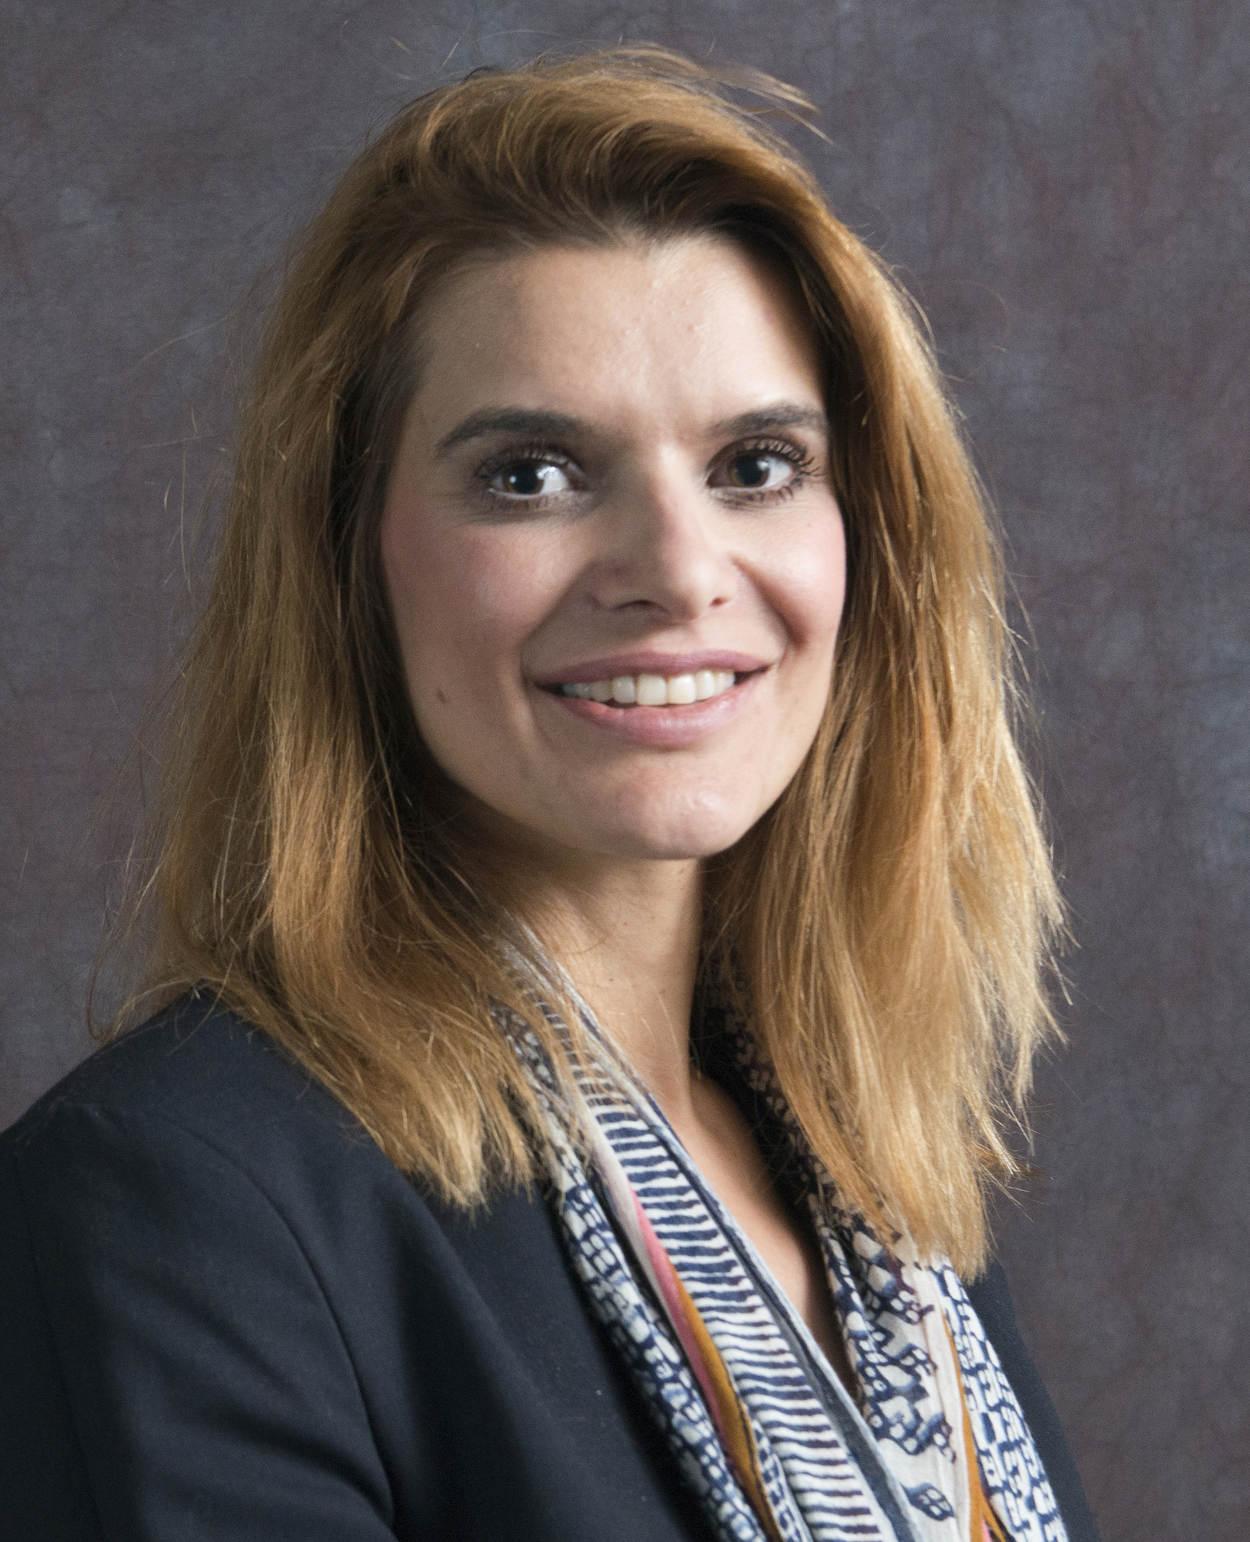 Staatssecretaris Barbara Visser